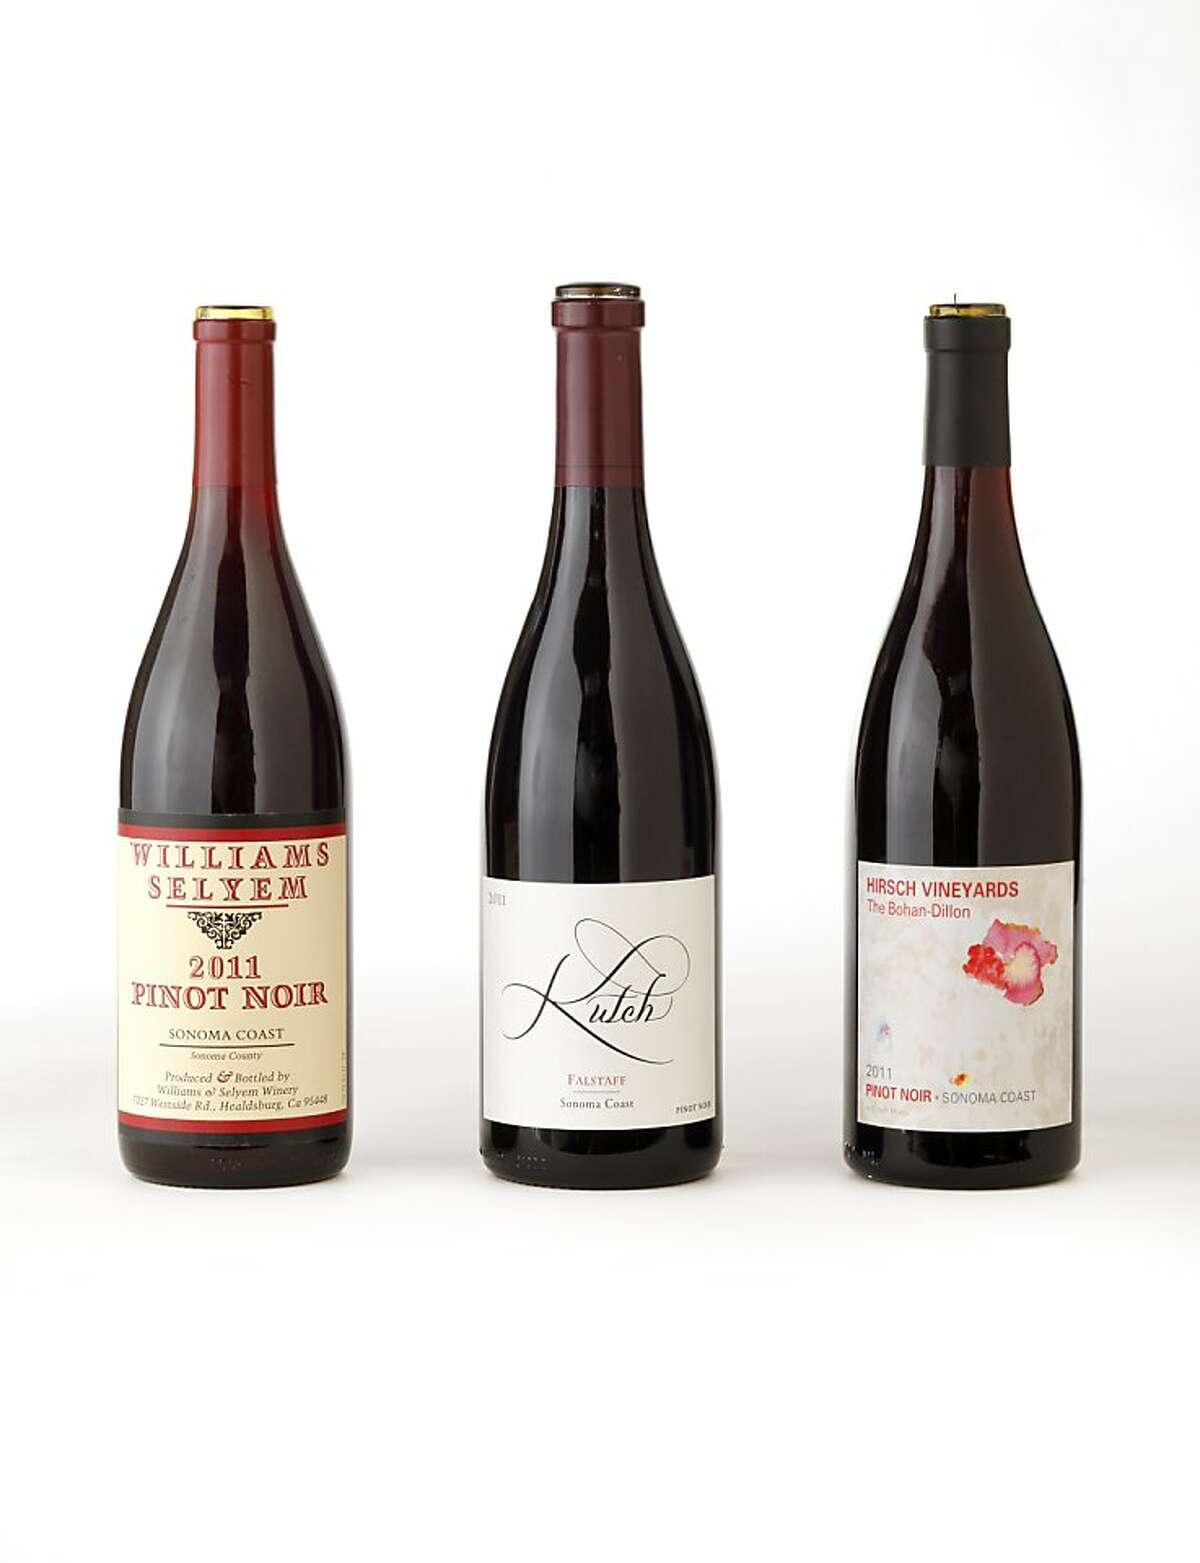 Left-right: (Sonoma Coast Pinot Noir): 2011 Williams Selyem Pinot Noir, 2011 Kutch Wines Falstaff Pinot Noir, 2011 Hirsch Vineyards The Bohan-Dillon Pinot Noir as seen in San Francisco, California, on August 7, 2013.